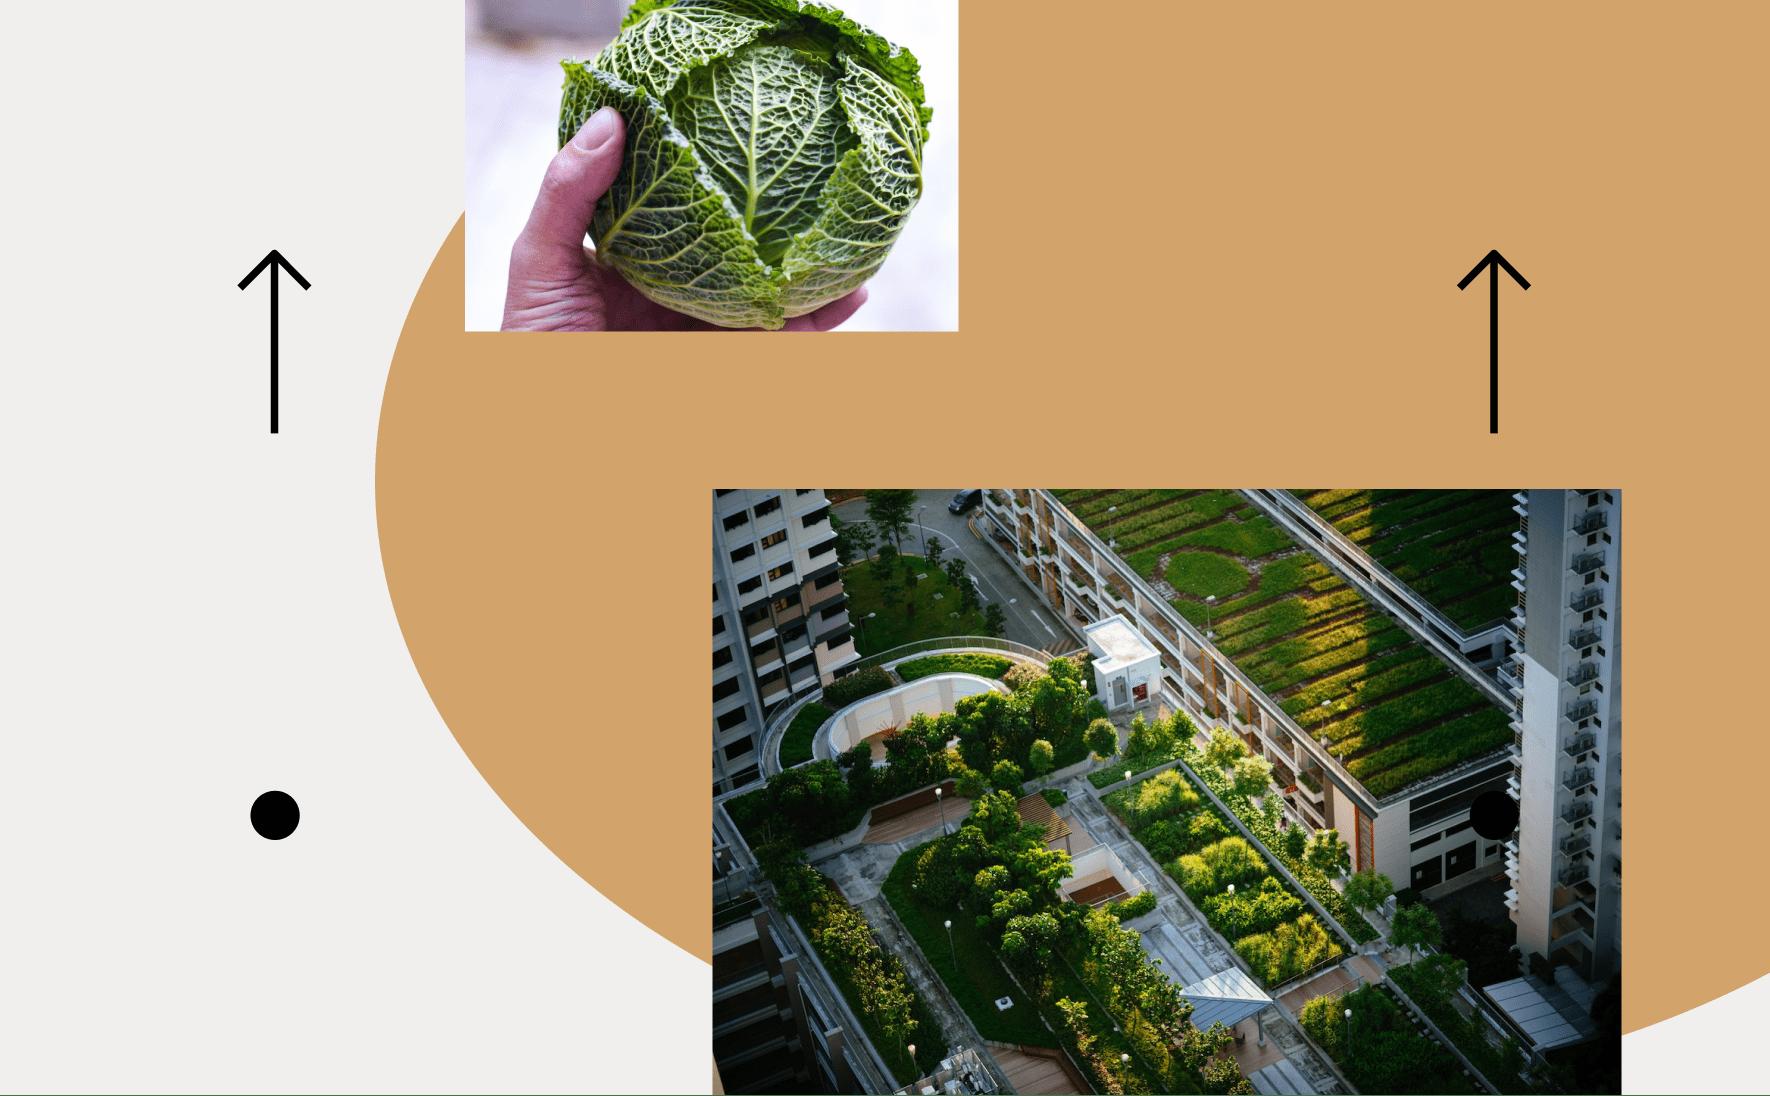 Что такое сады?